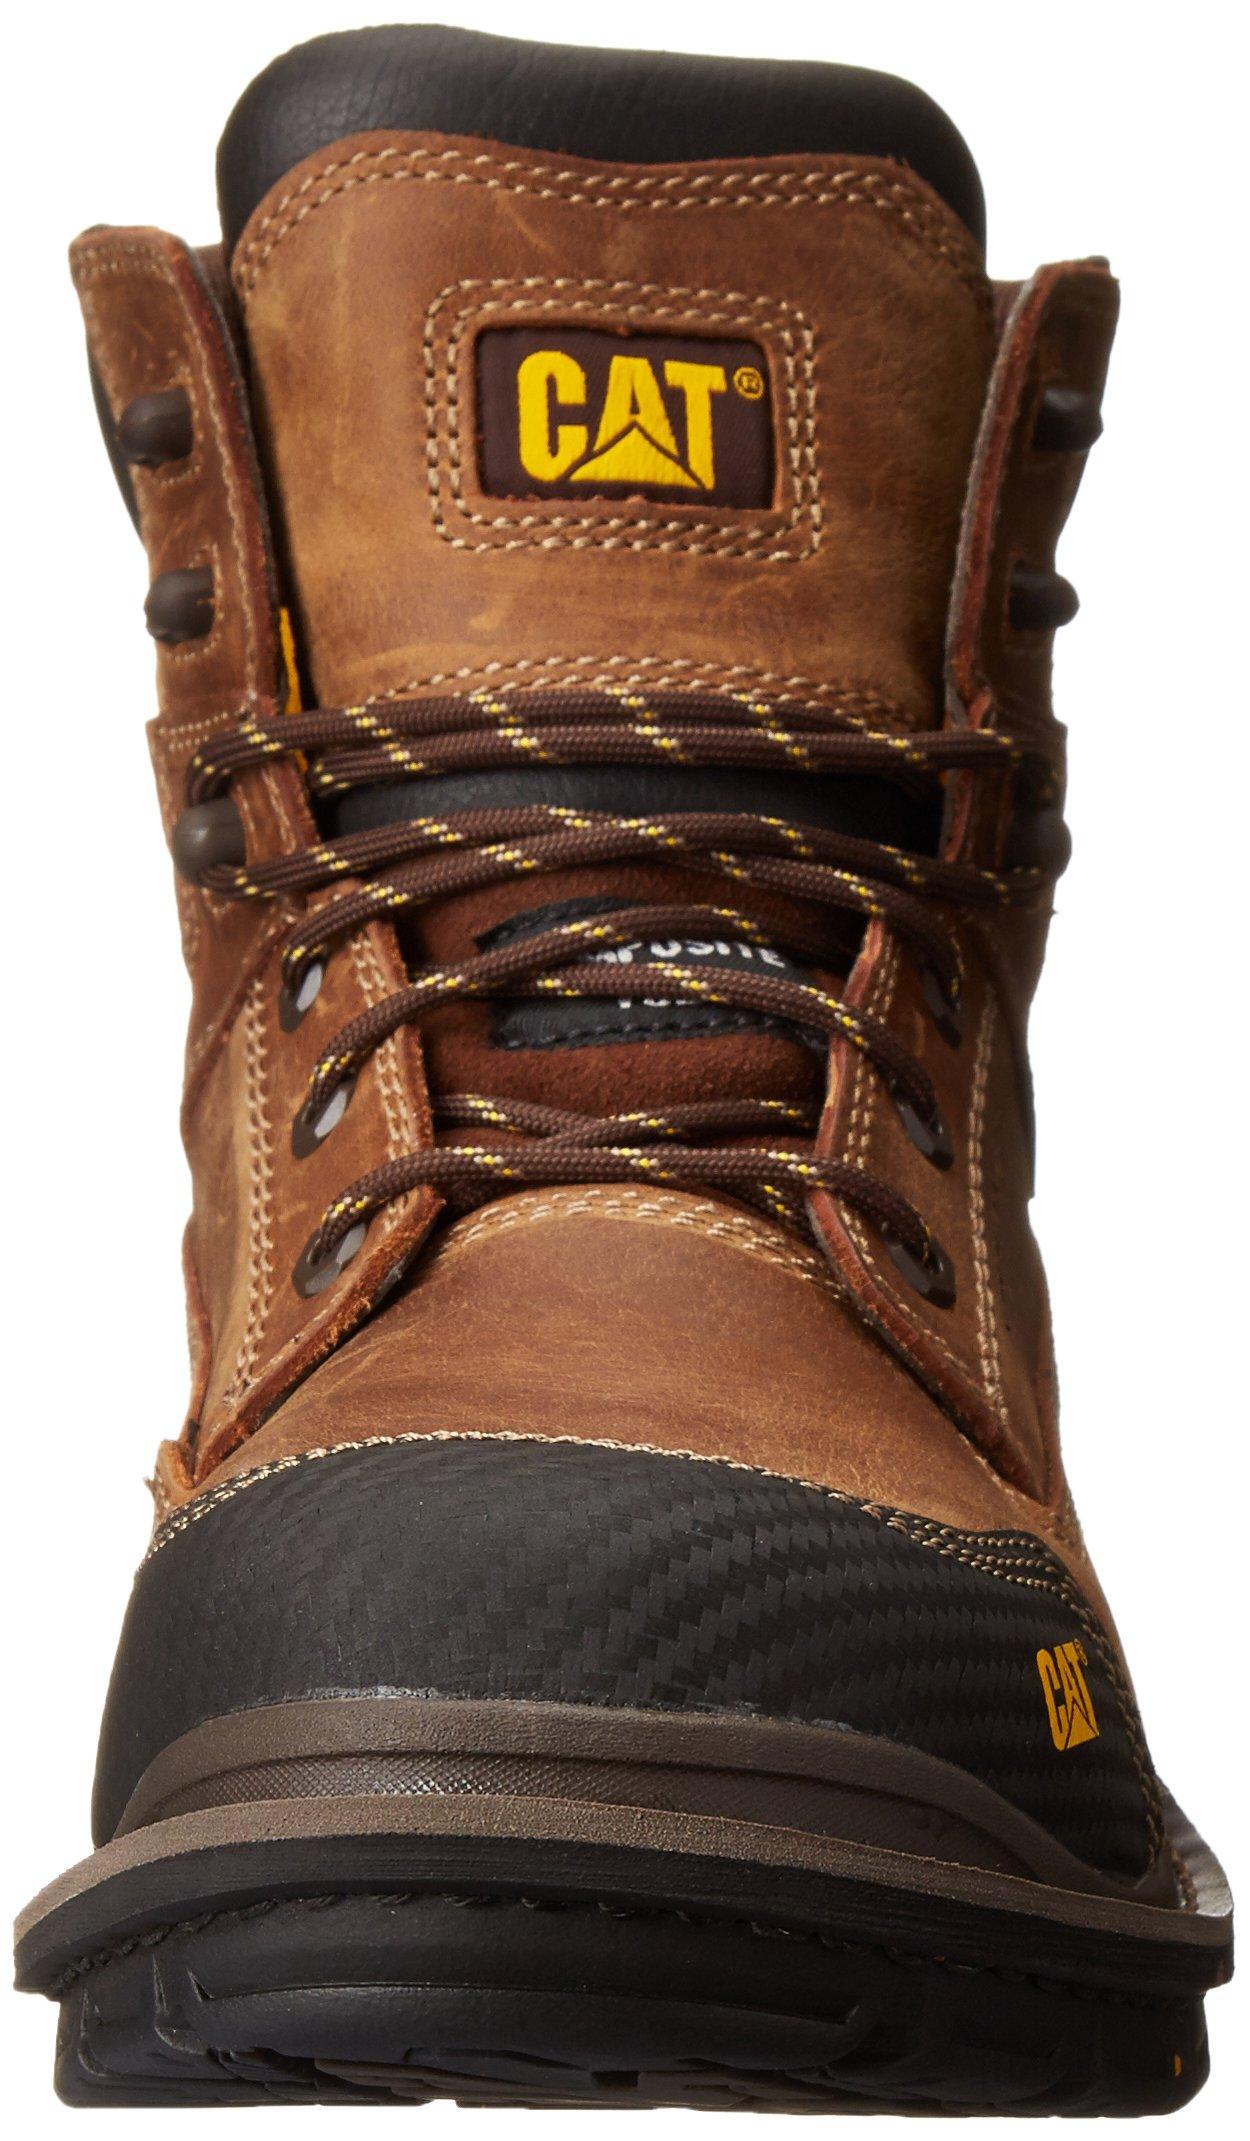 Caterpillar Men's Fabricate 6 Inch Tough Waterproof Comp Toe Work Boot, Brown, 14 M US by Caterpillar (Image #4)